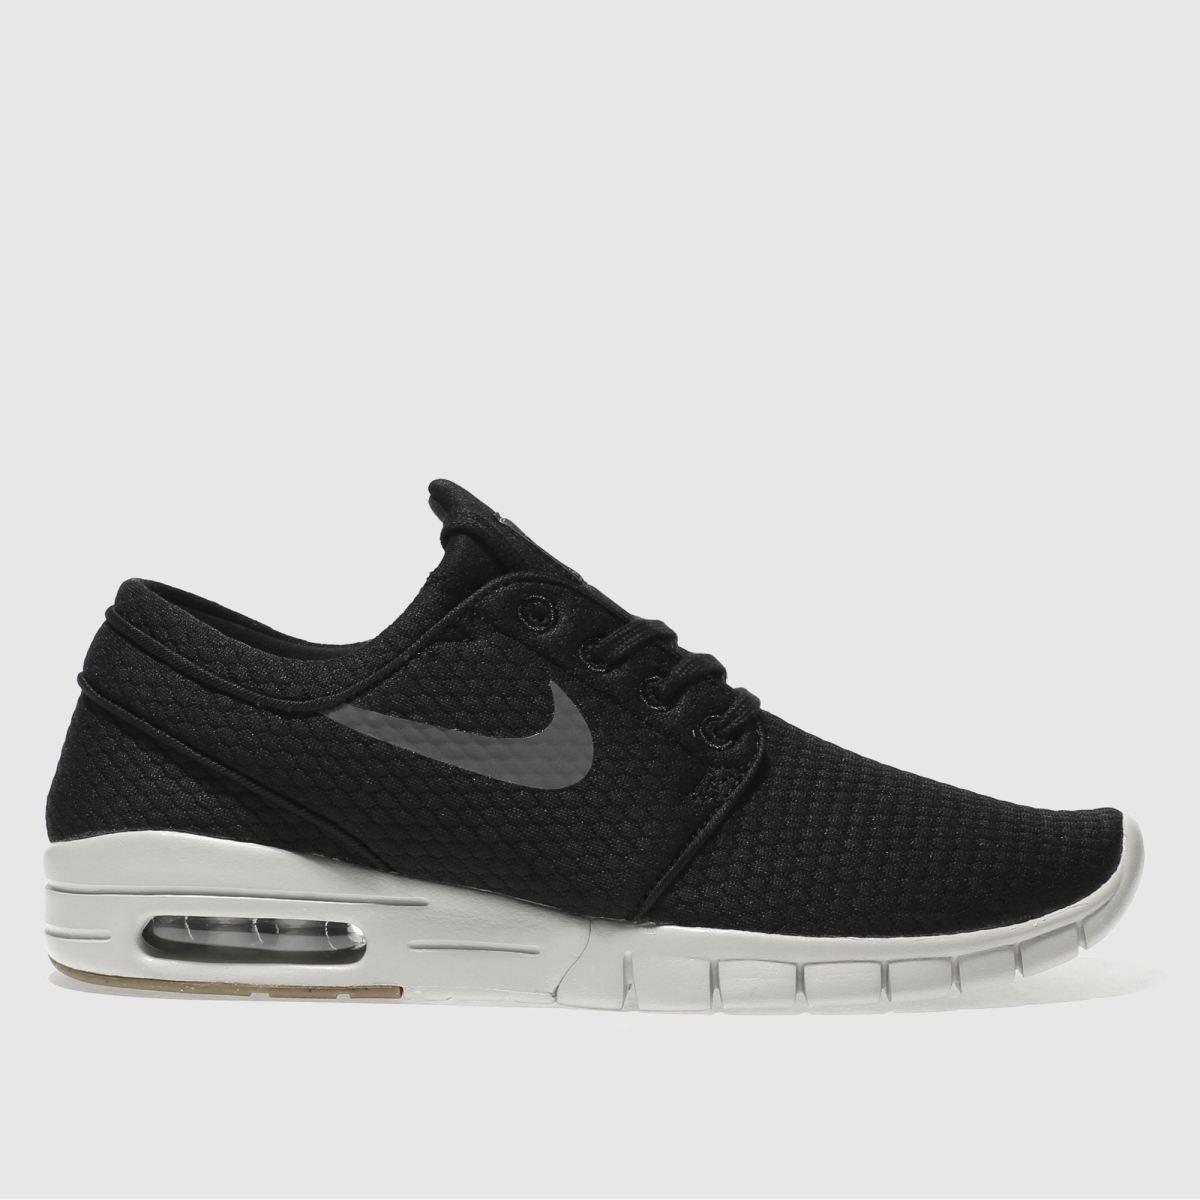 Nike SB Nike Sb Black & Grey Stefan Janoski Max Trainers